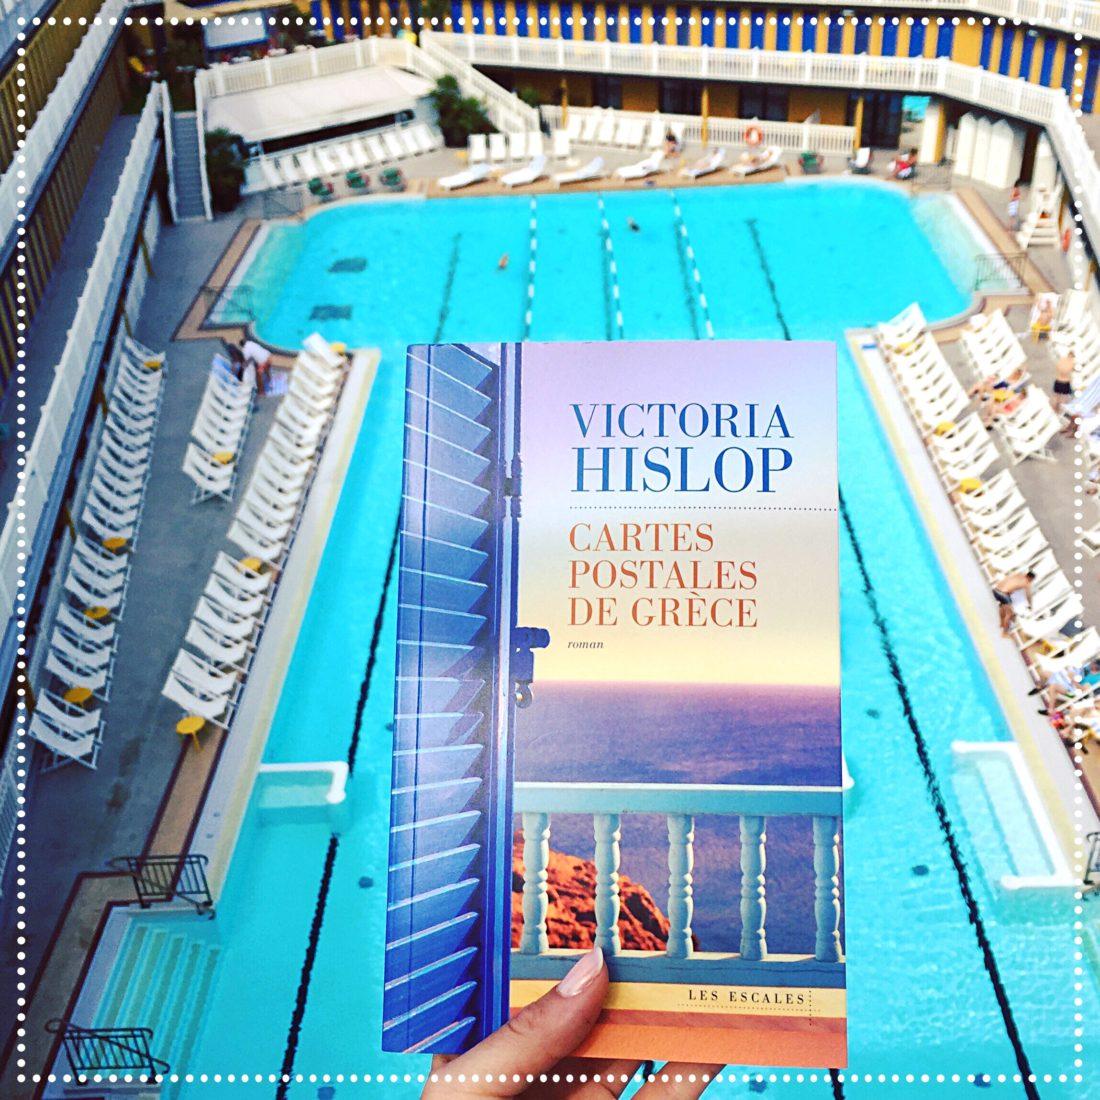 booksnjoy - cartes postales de grece - victoria hislop